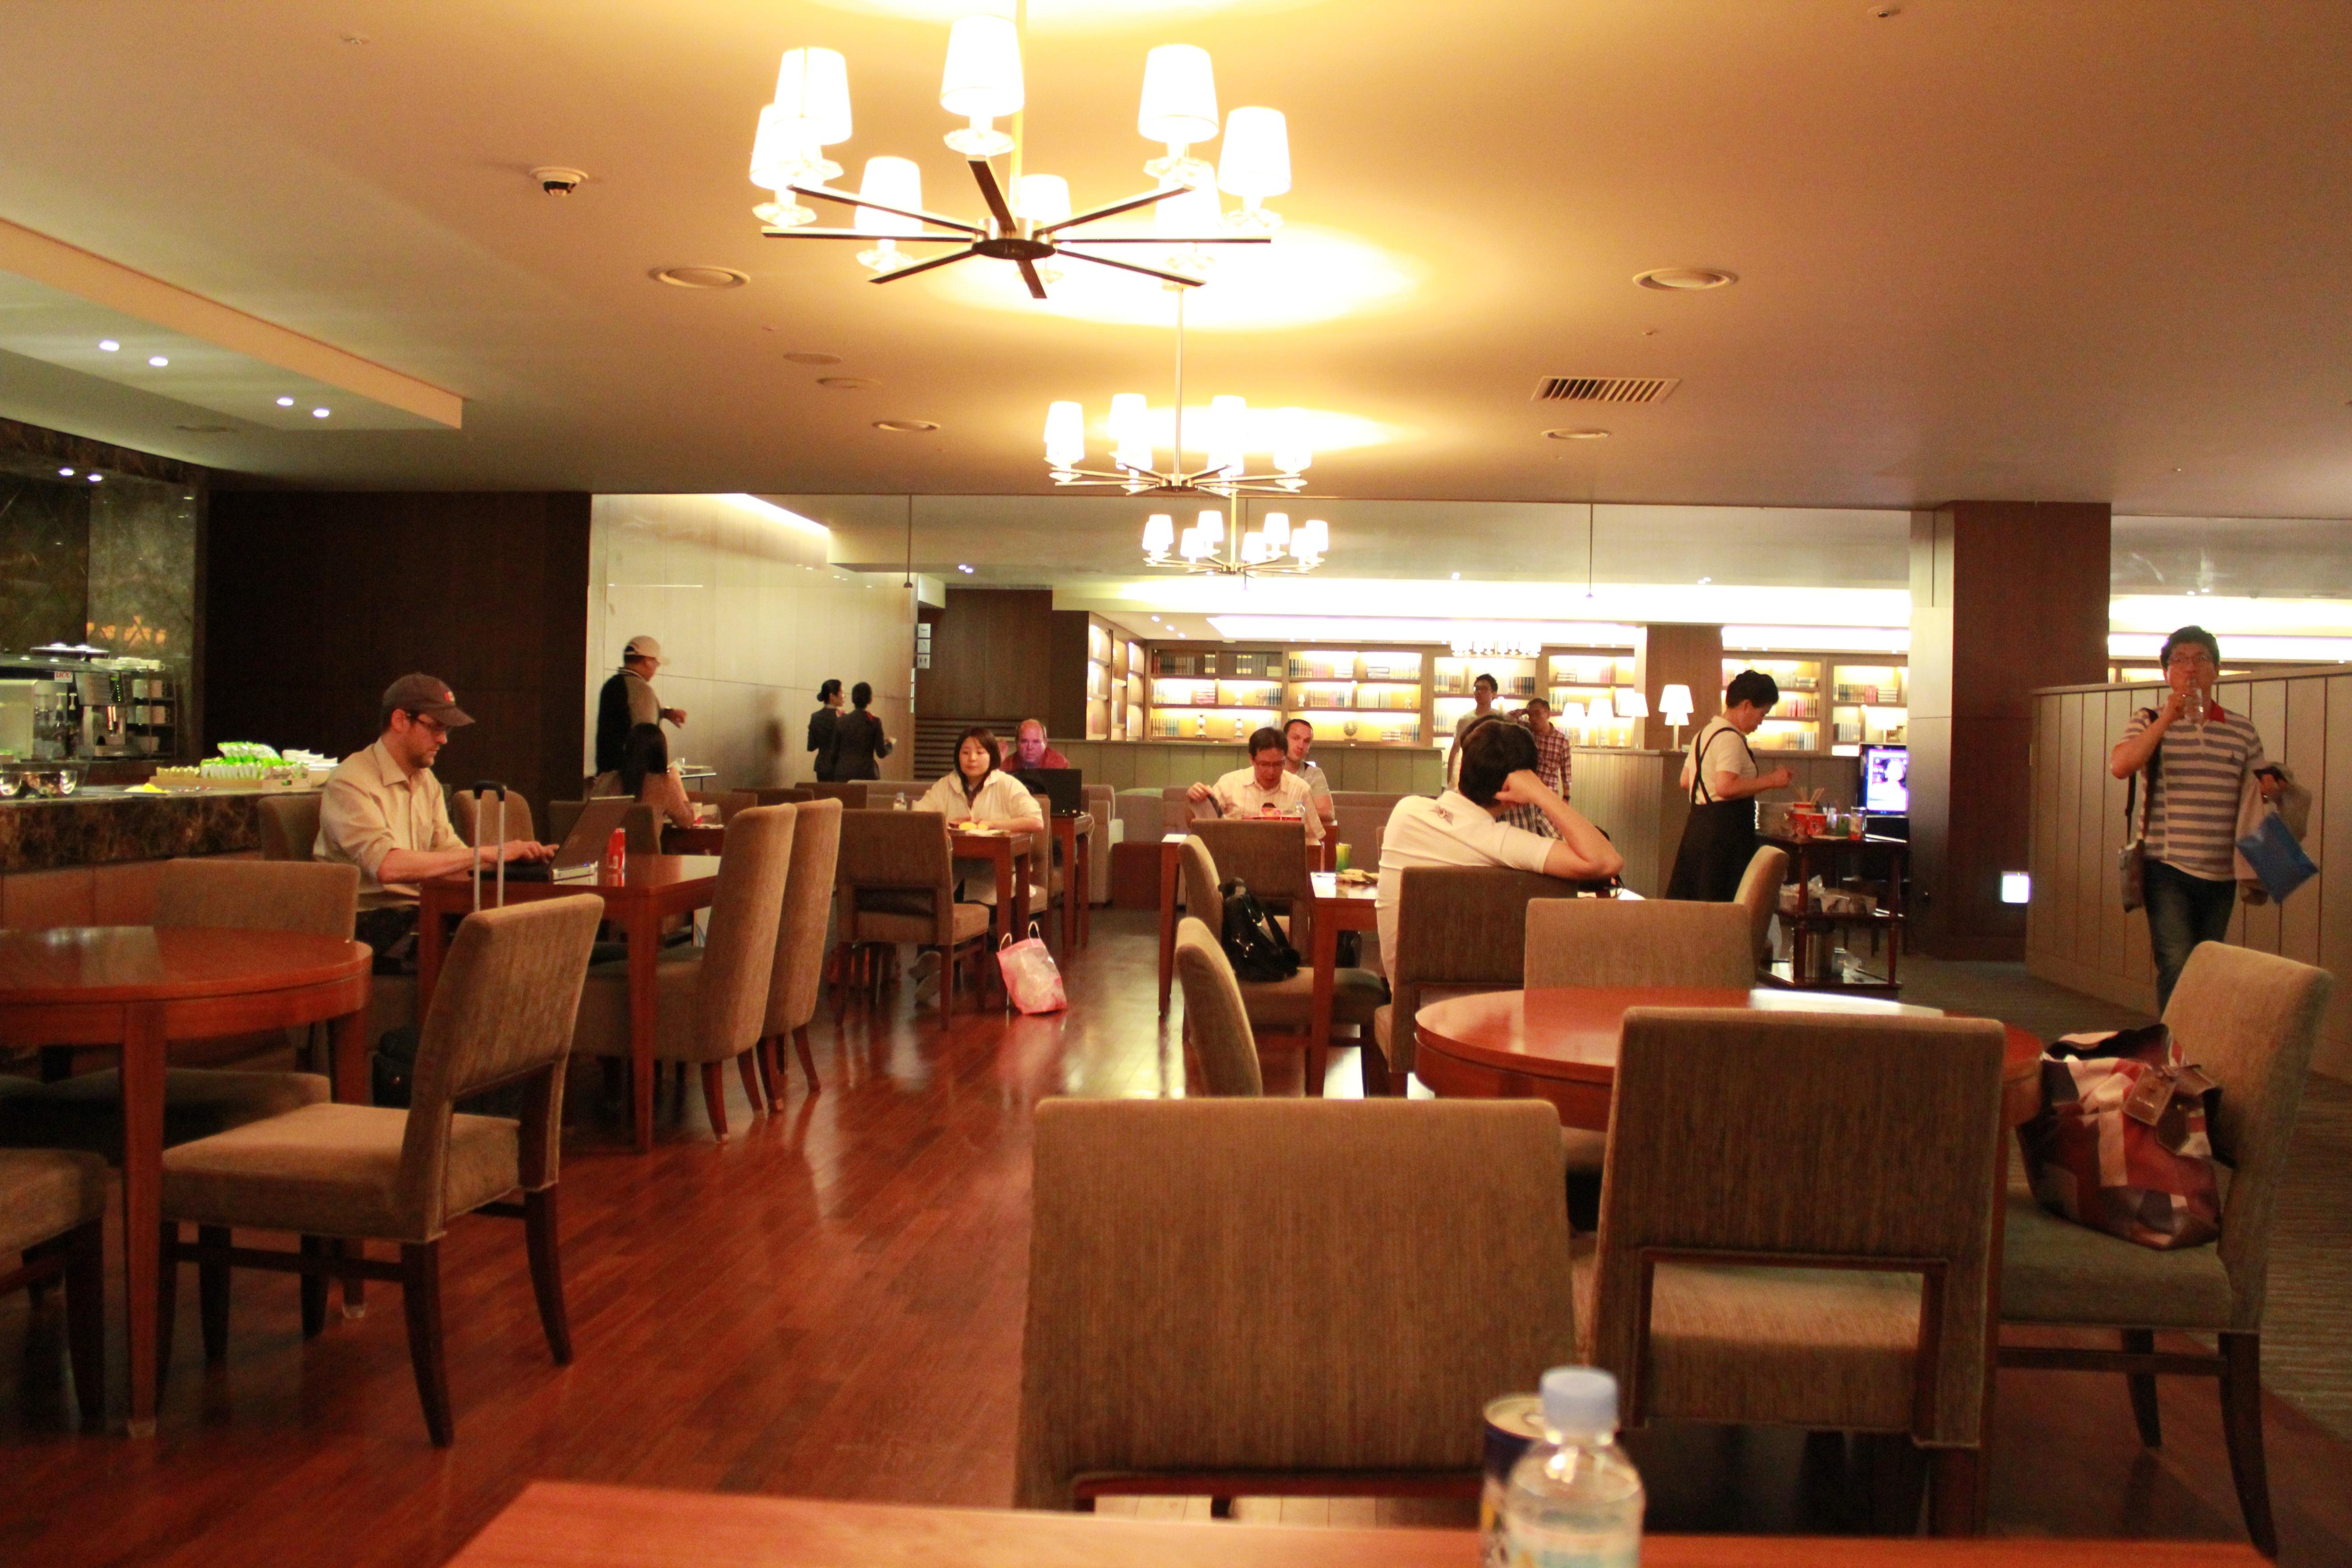 Fotos gratis cafeter a restaurante aeropuerto comida - Diseno de interiores gratis ...